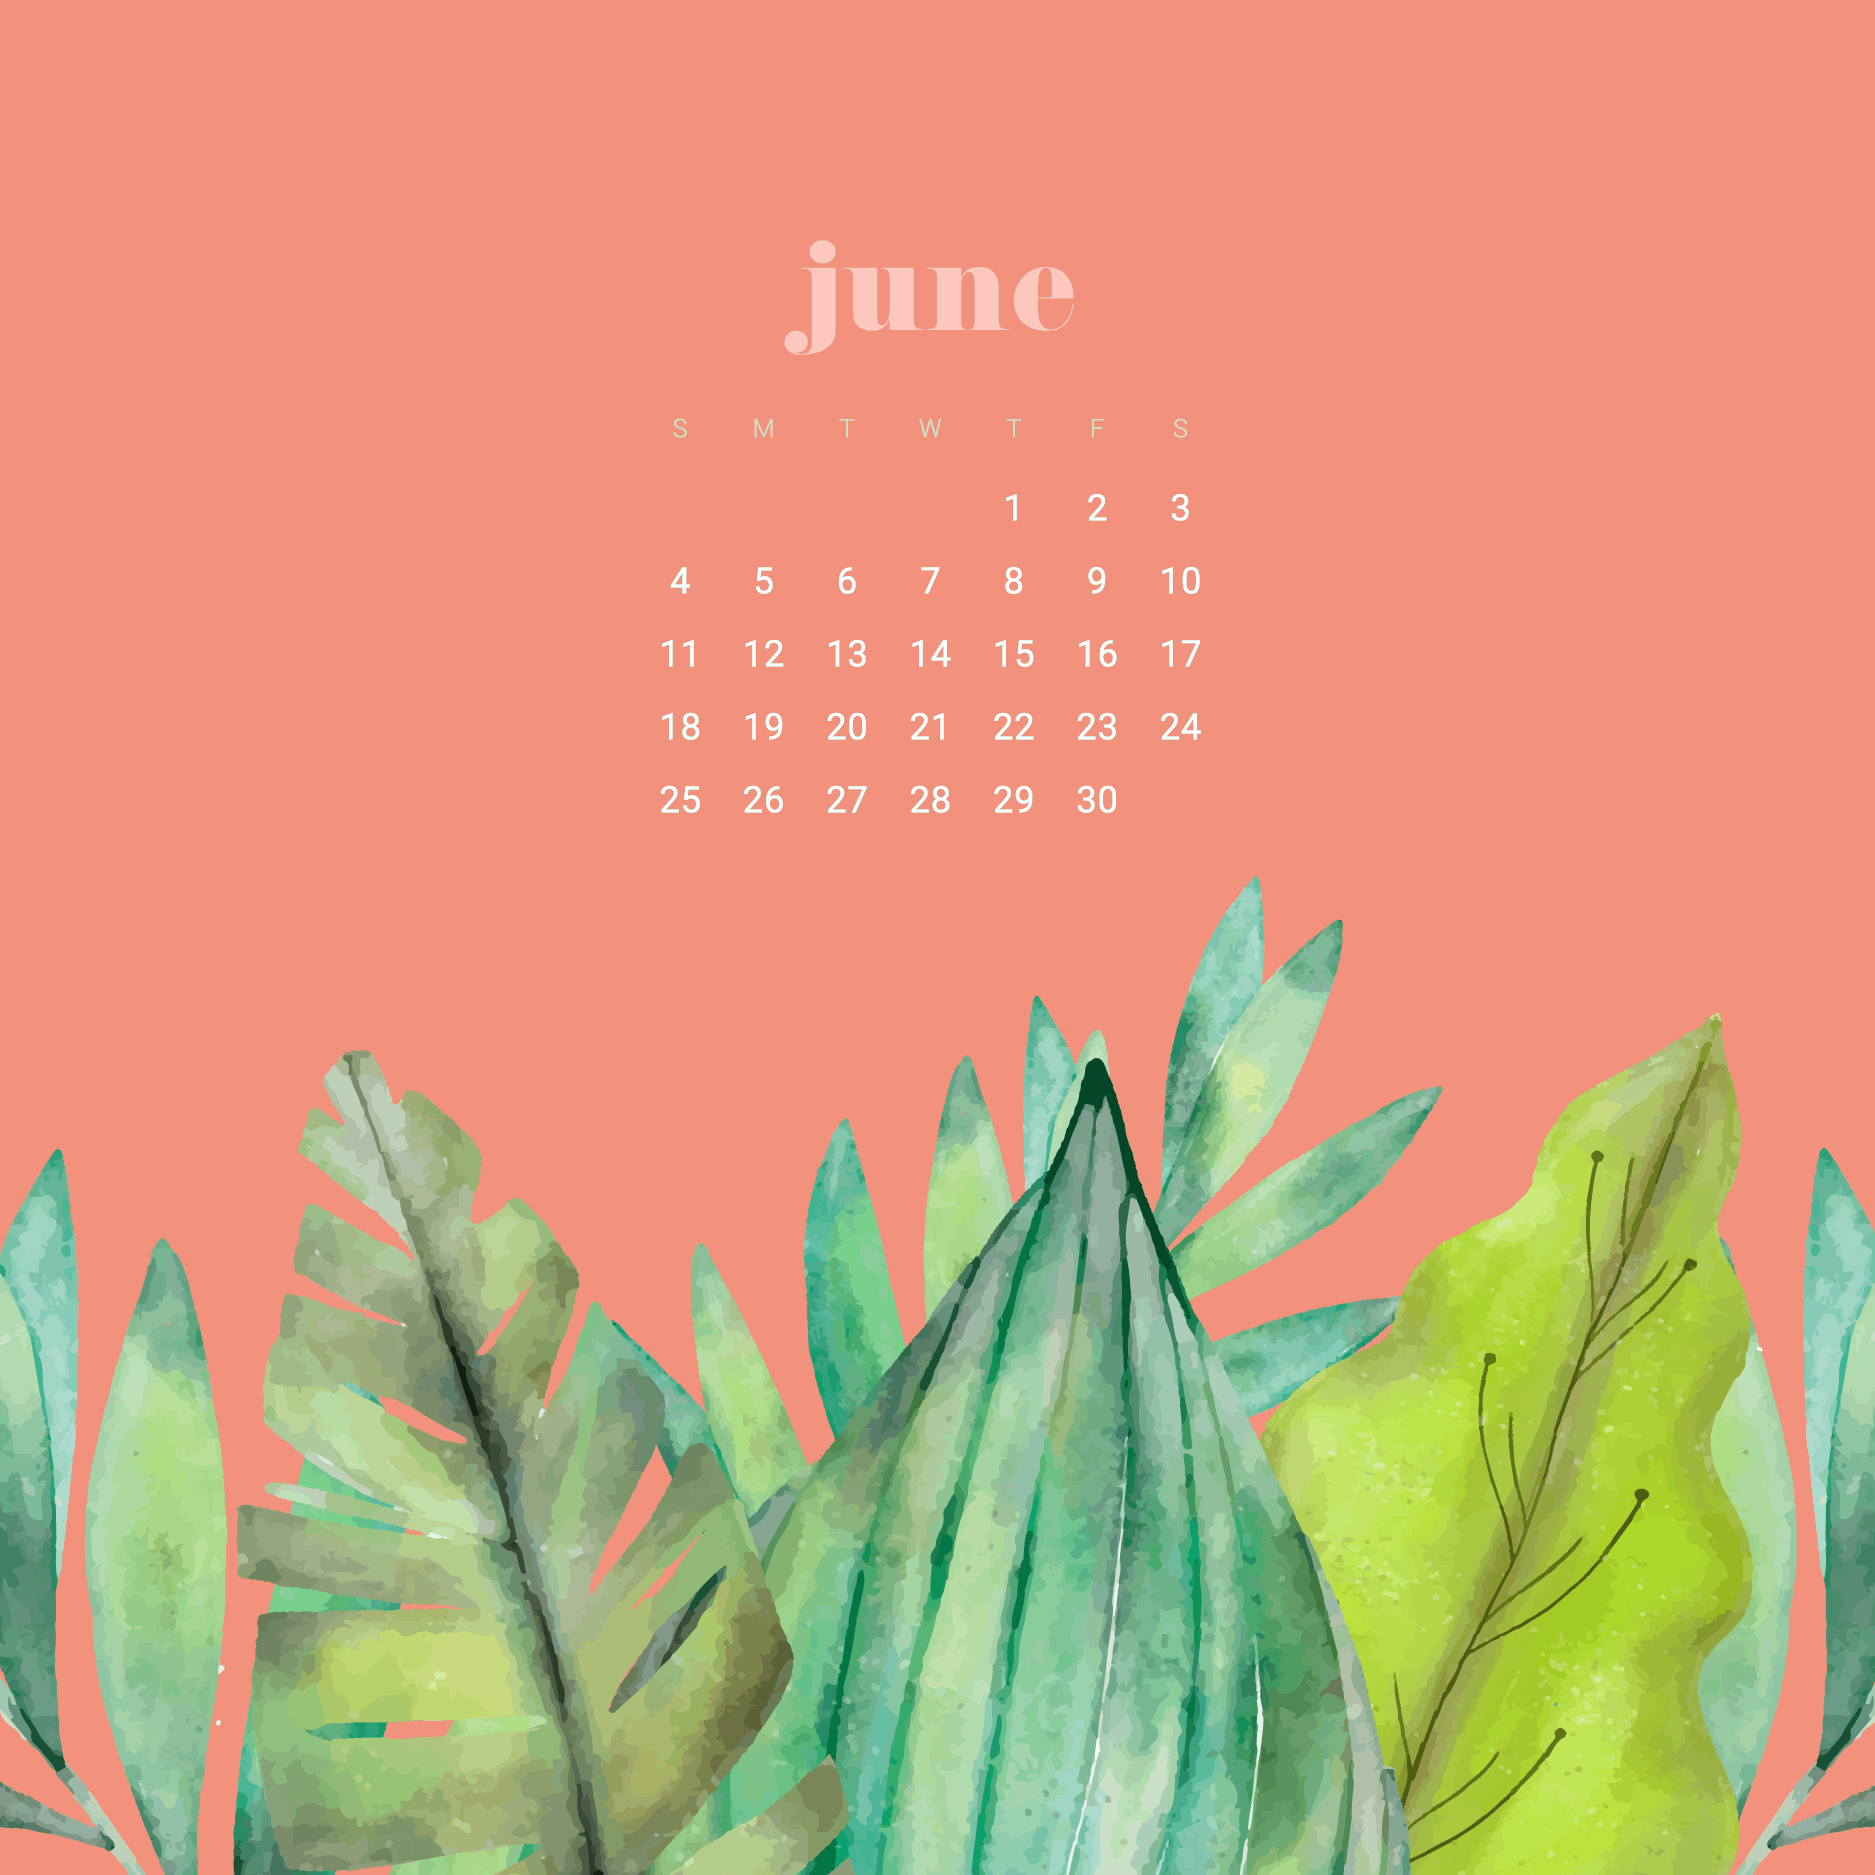 free june desktop wallpaper calendars featuring greenery